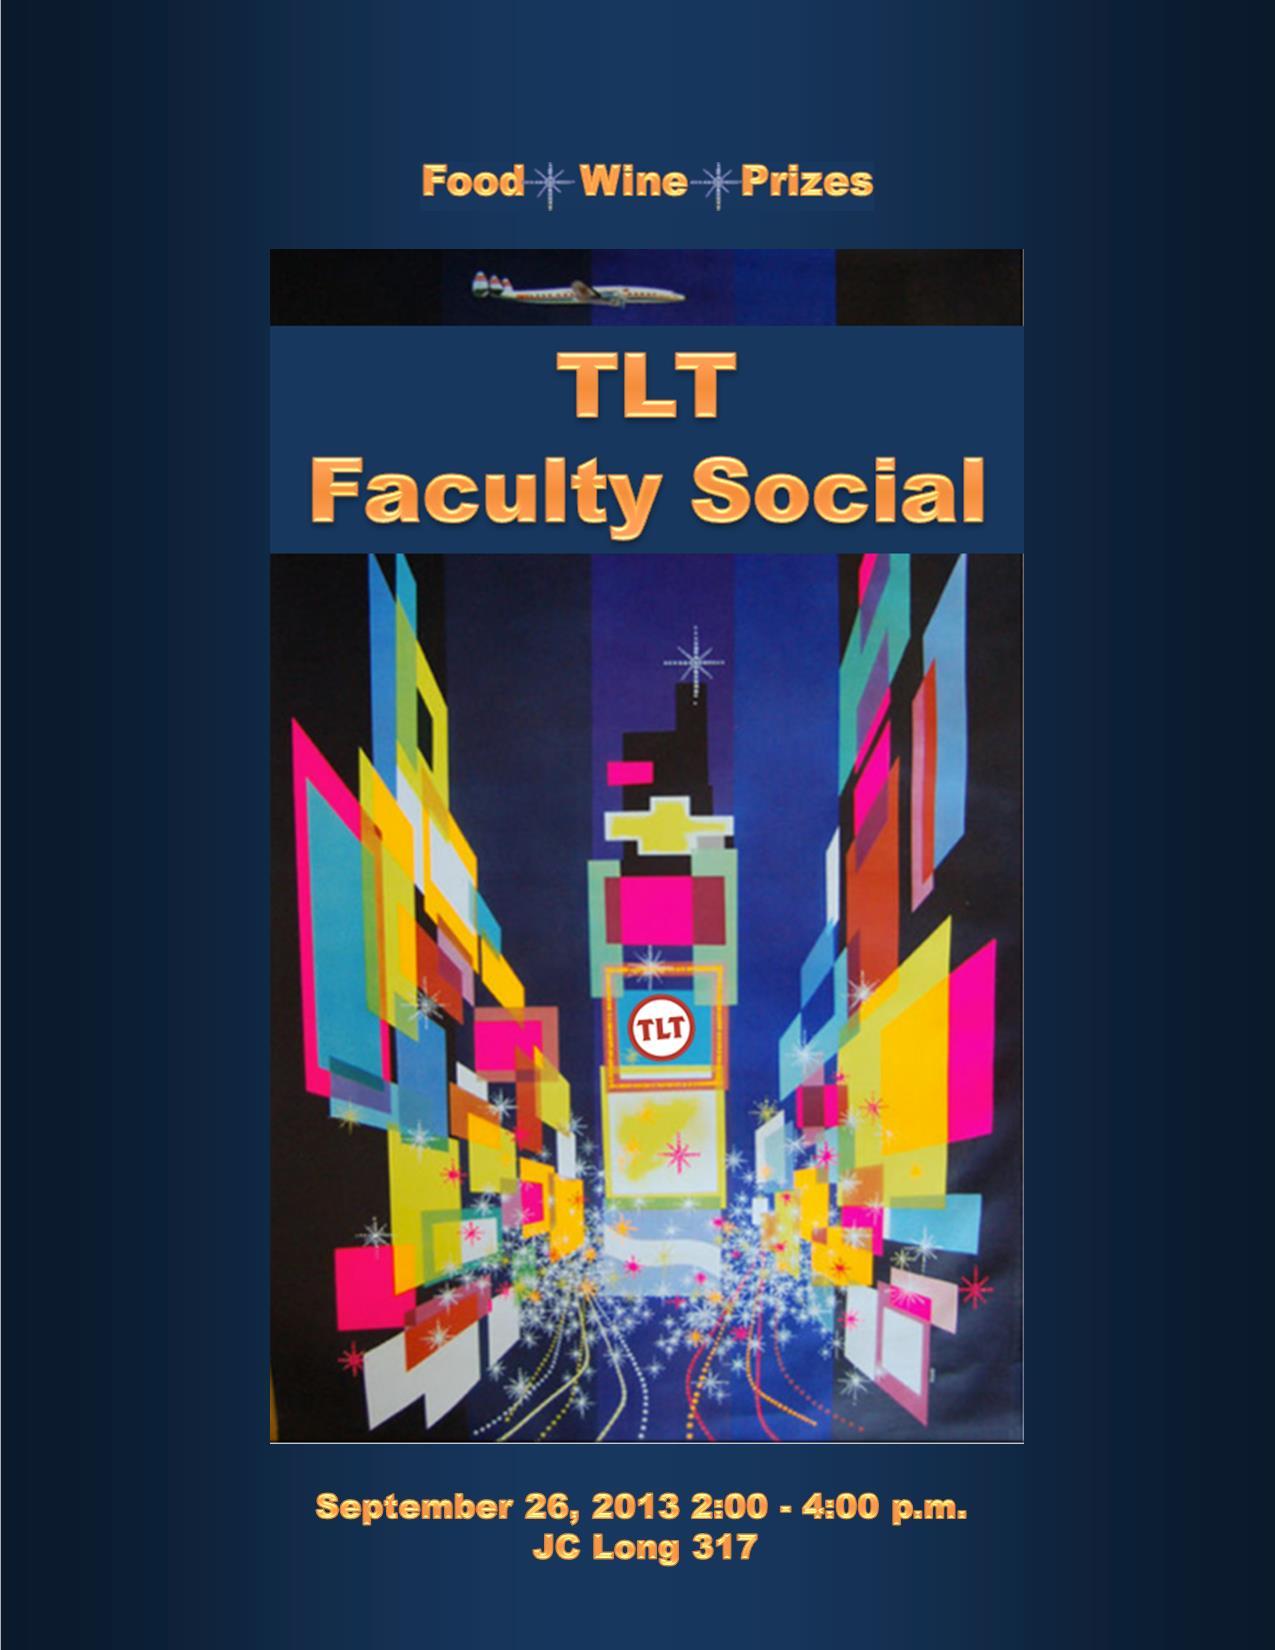 TLT Faculty Social